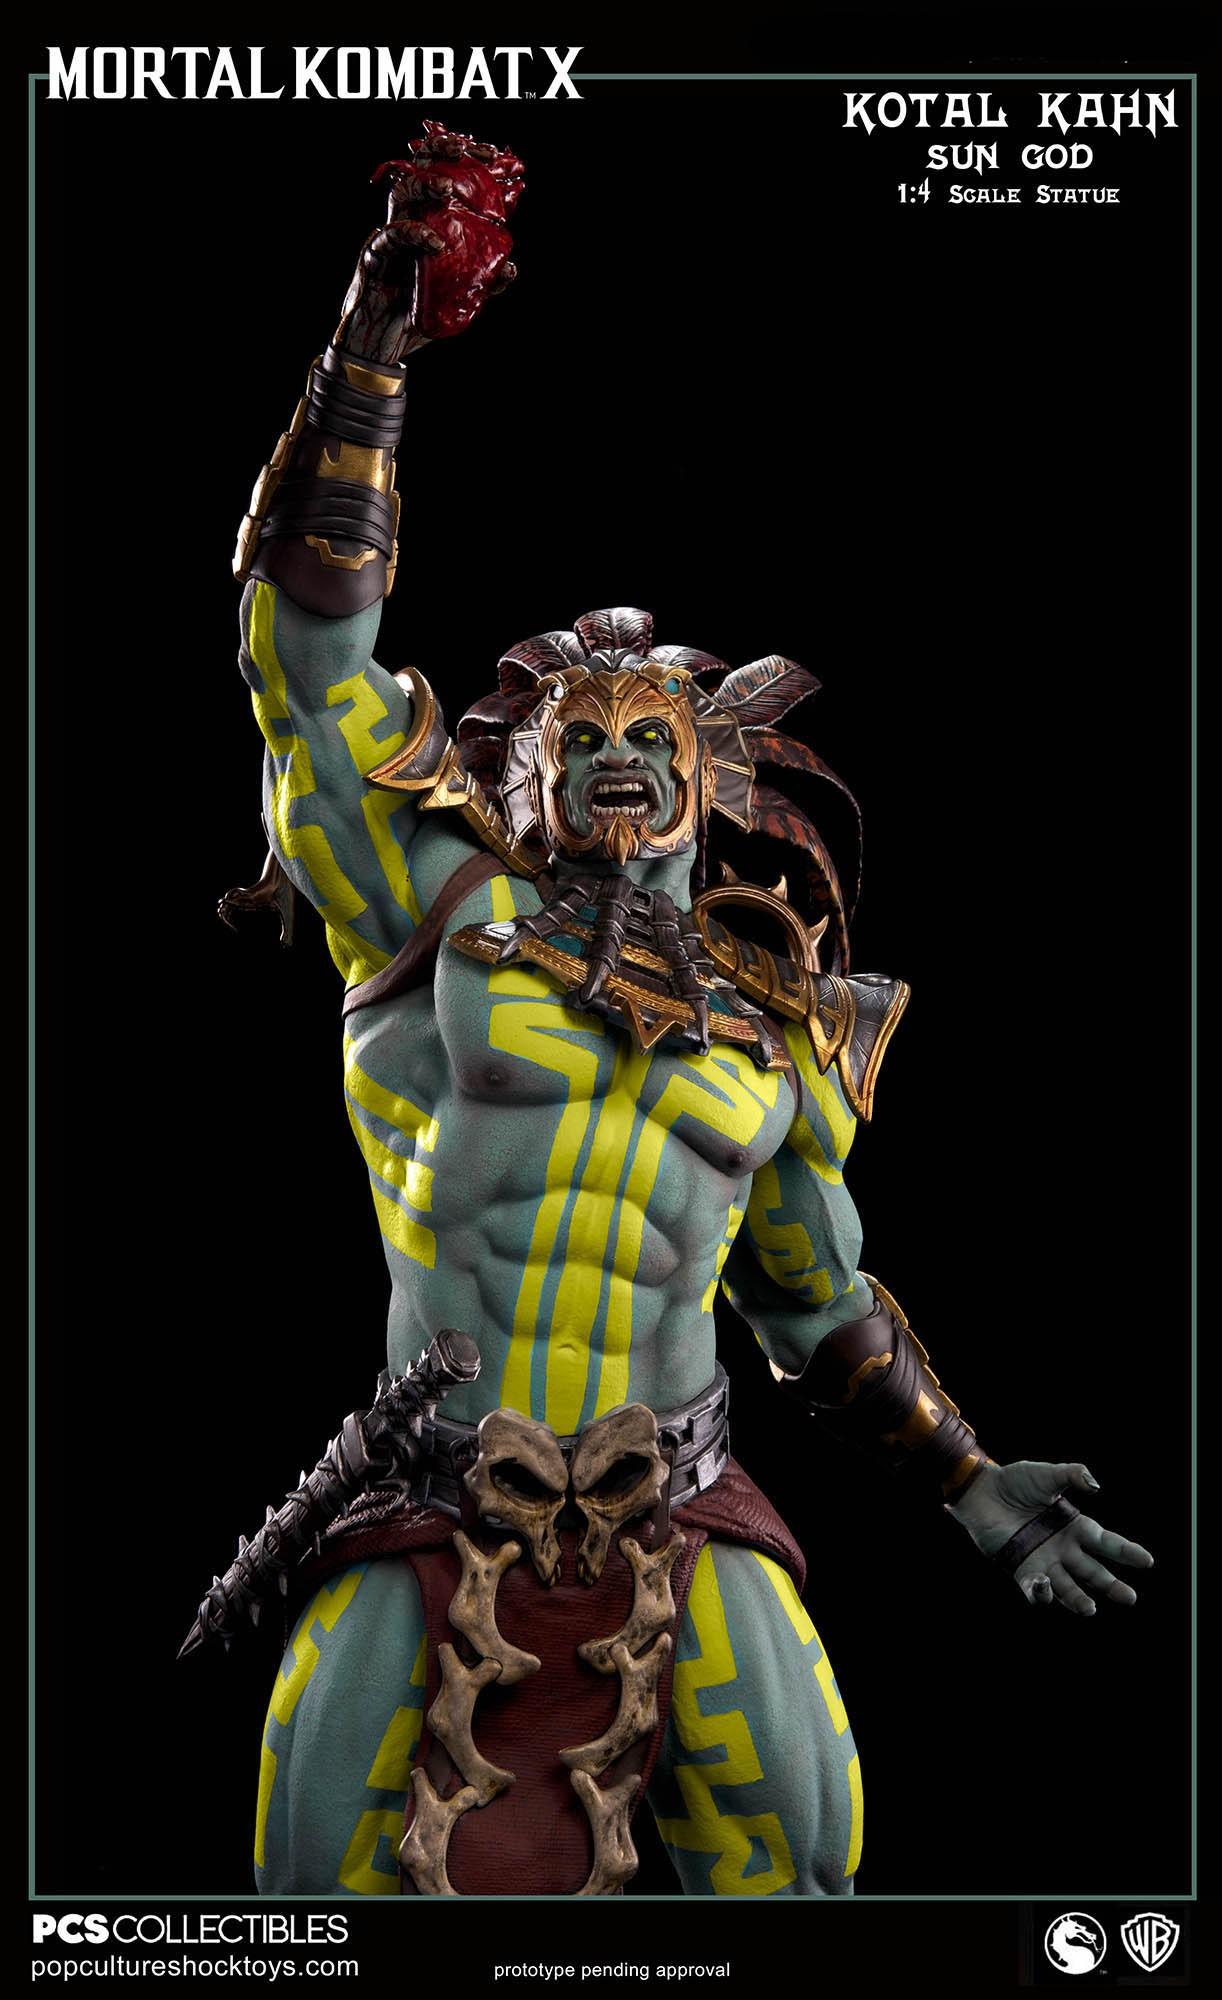 [Pop Culture Shock] Mortal Kombat X: Kotal Kahn 1:4 scale PCS-Kotal-Kahn-Sun-God-021